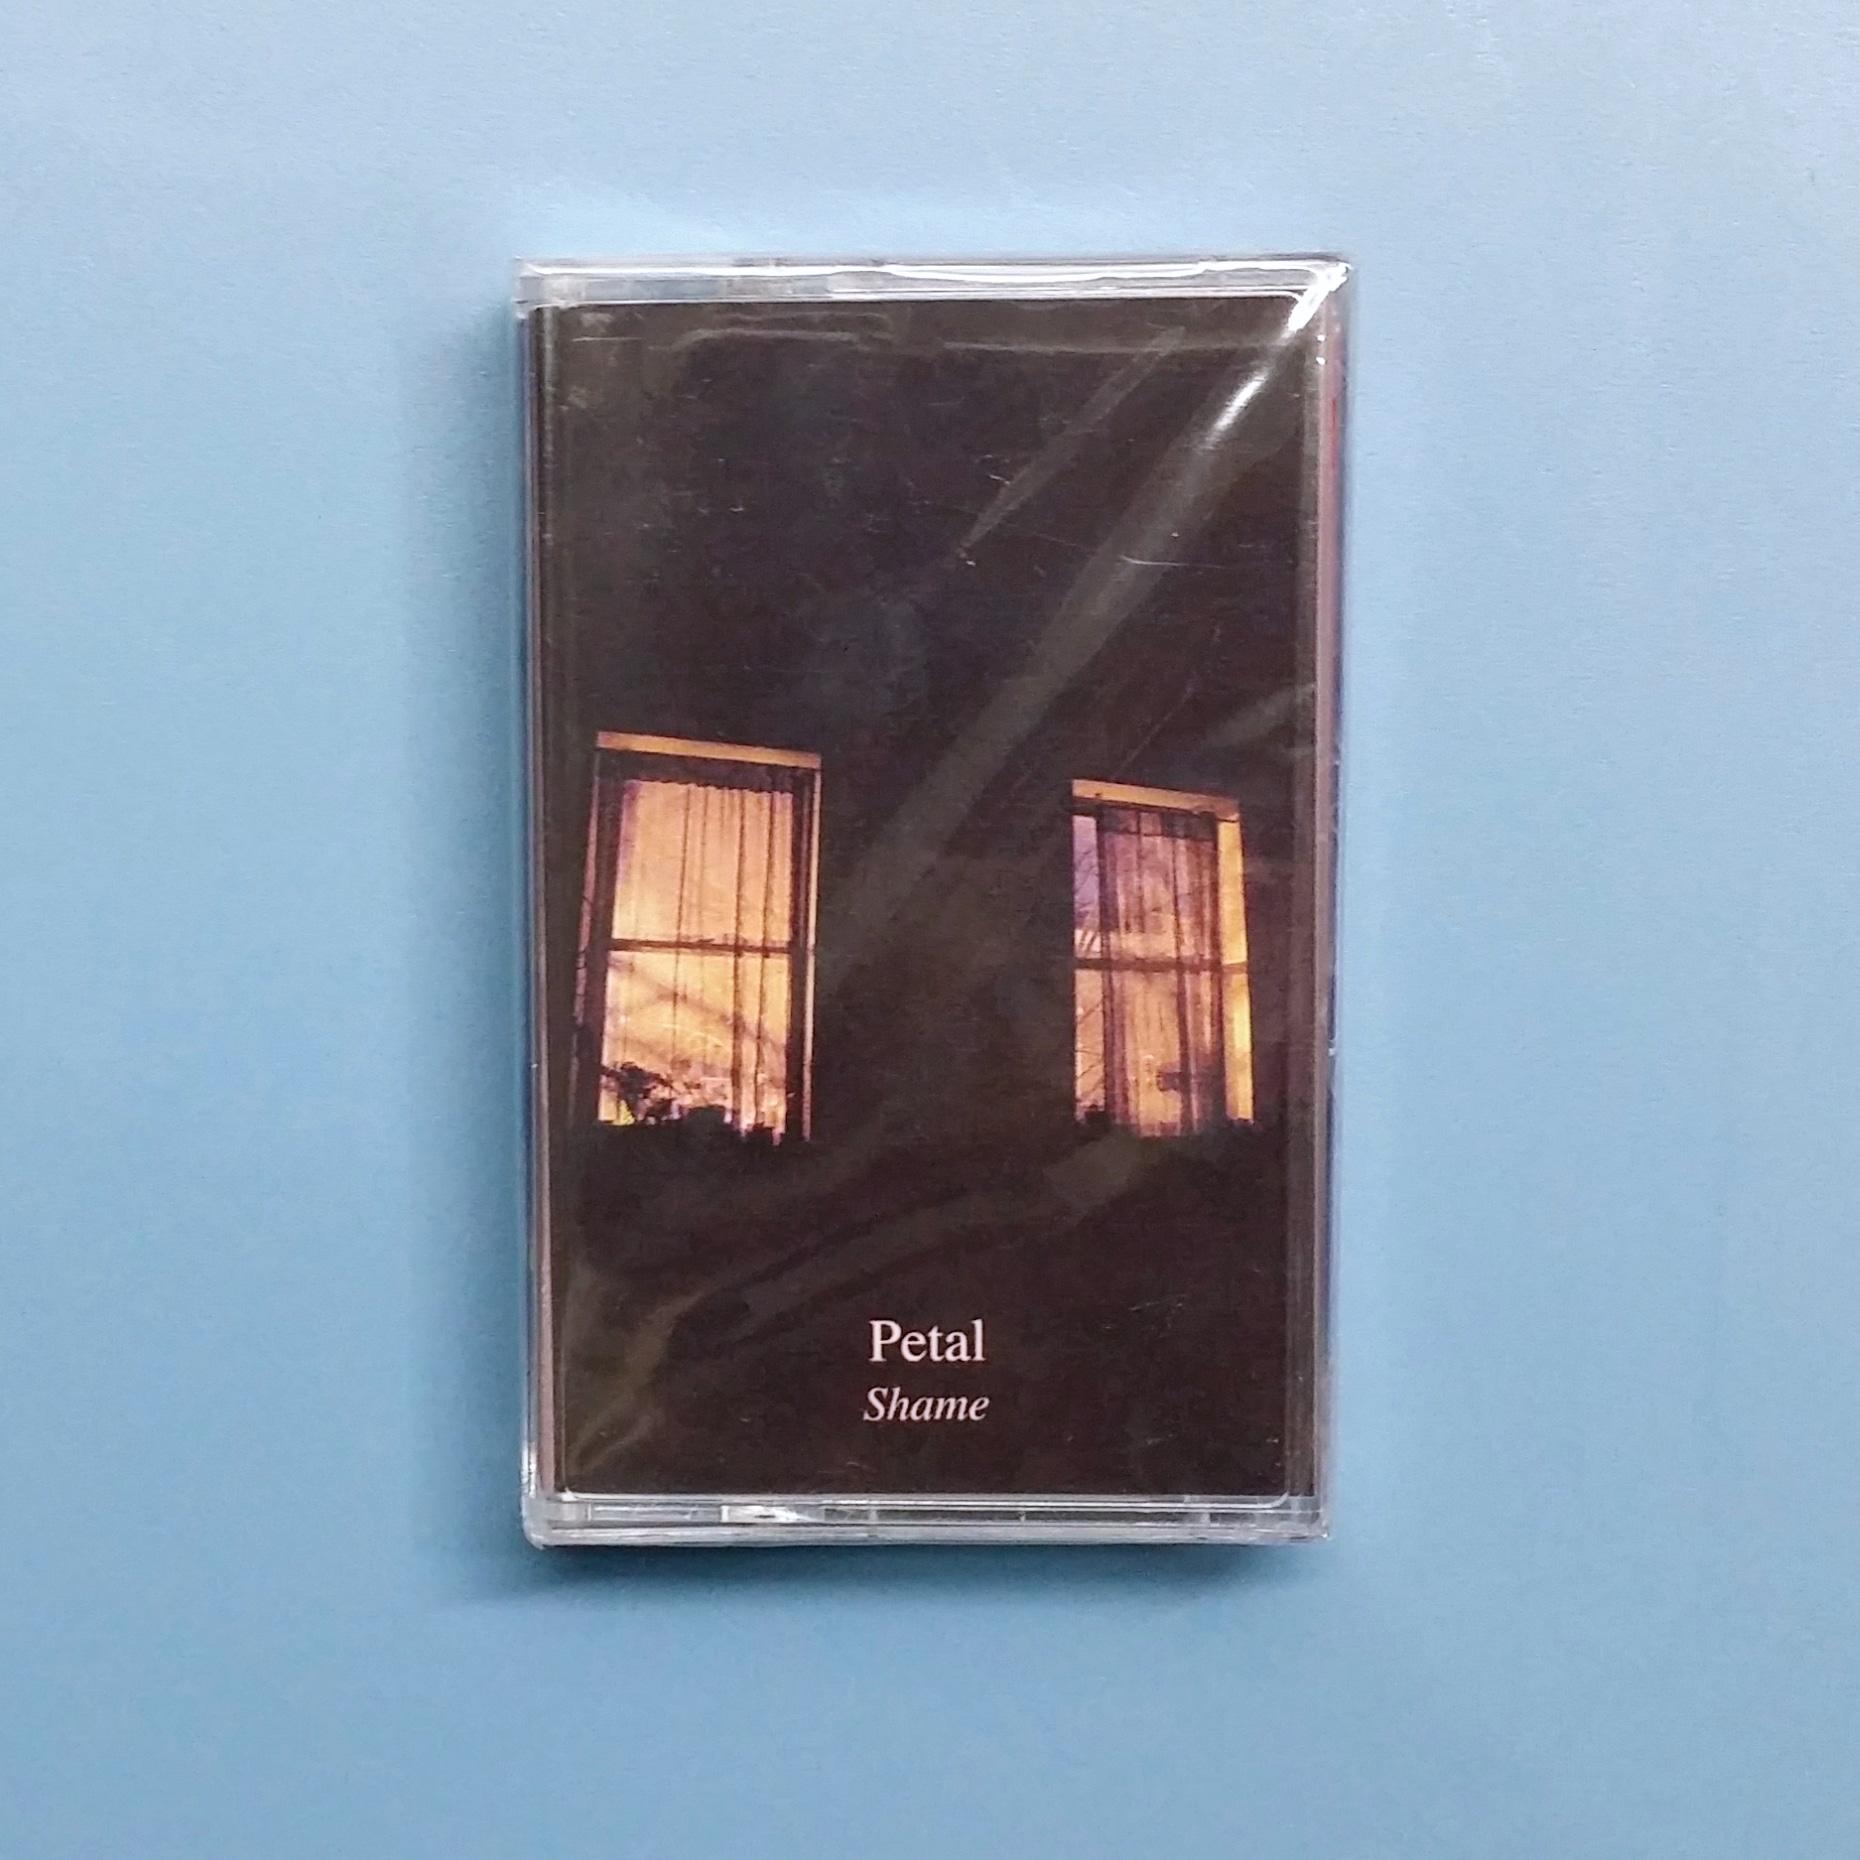 Petal - Shame (Run for Cover Records)